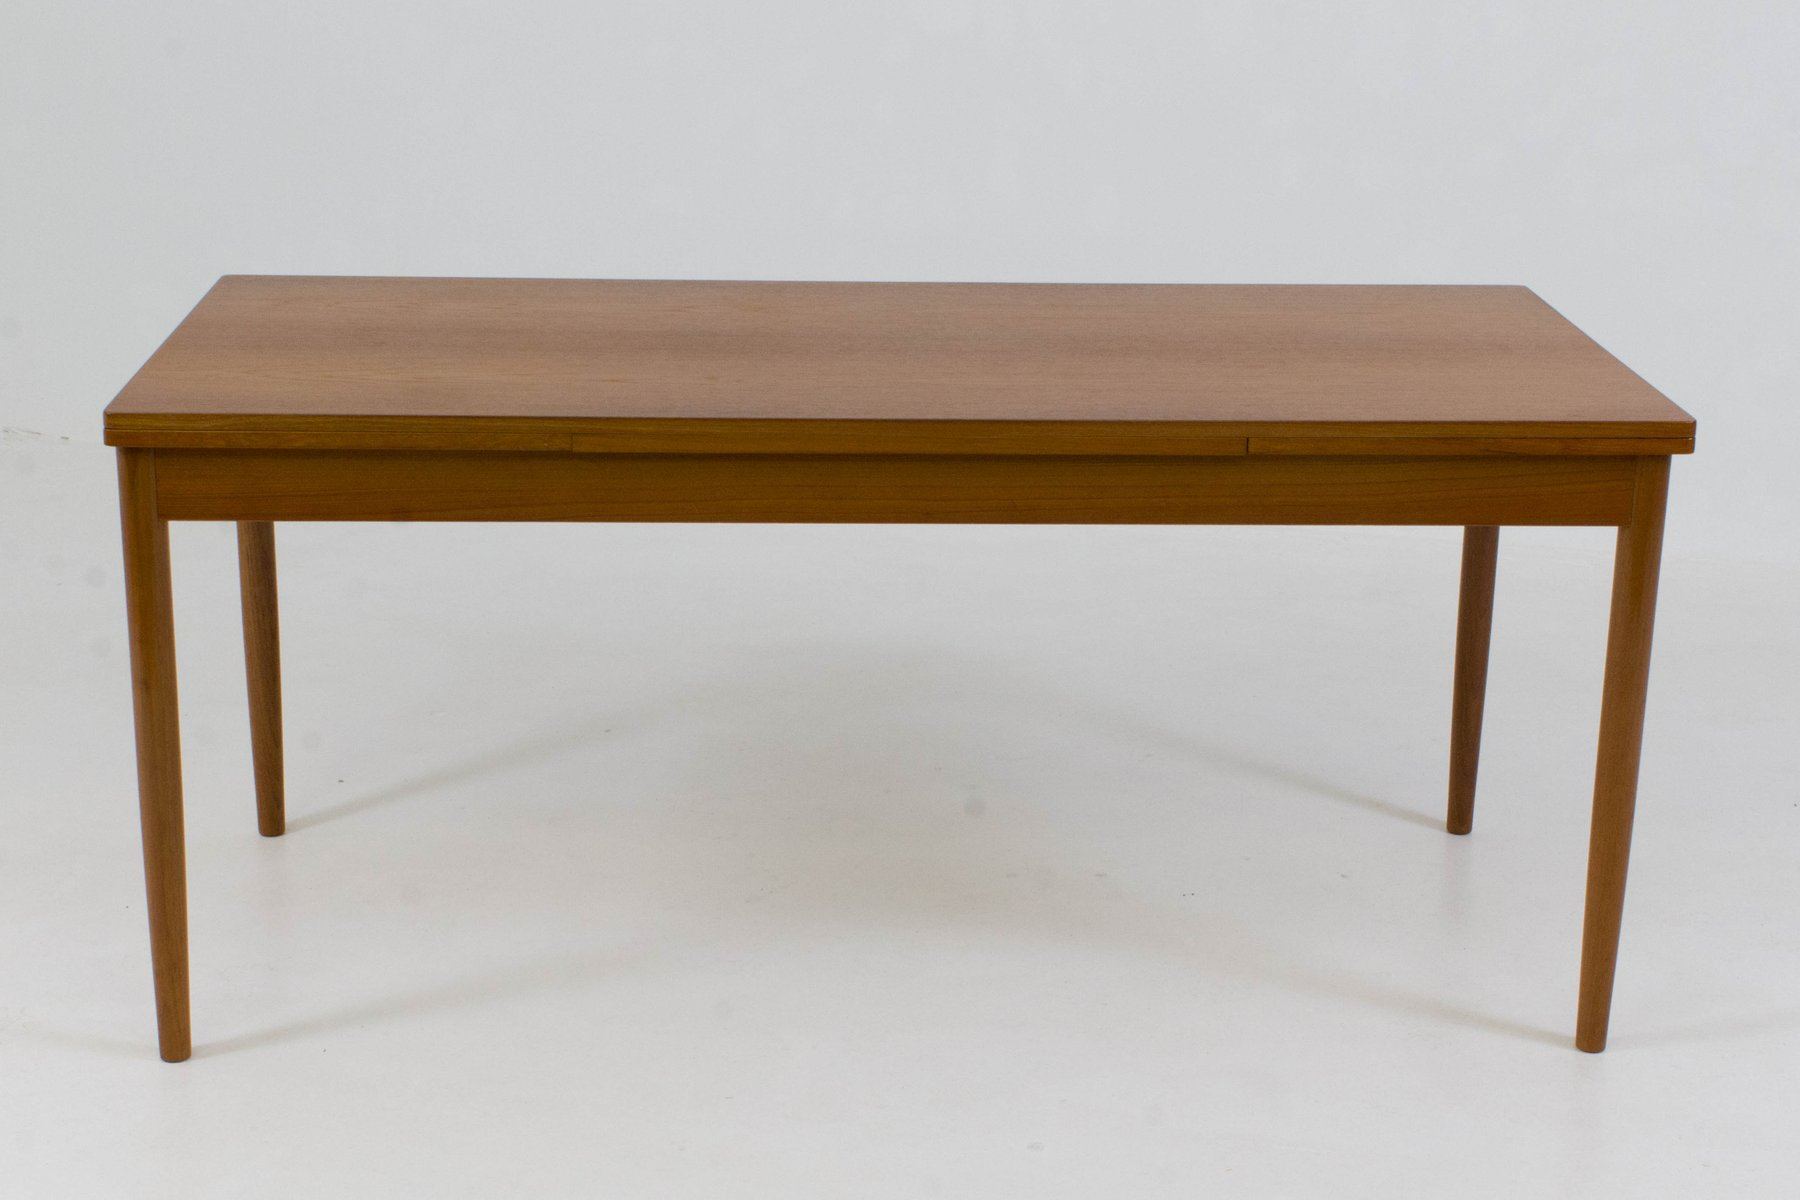 grande table de salle manger extensible danemark 1960s en vente sur pamono. Black Bedroom Furniture Sets. Home Design Ideas